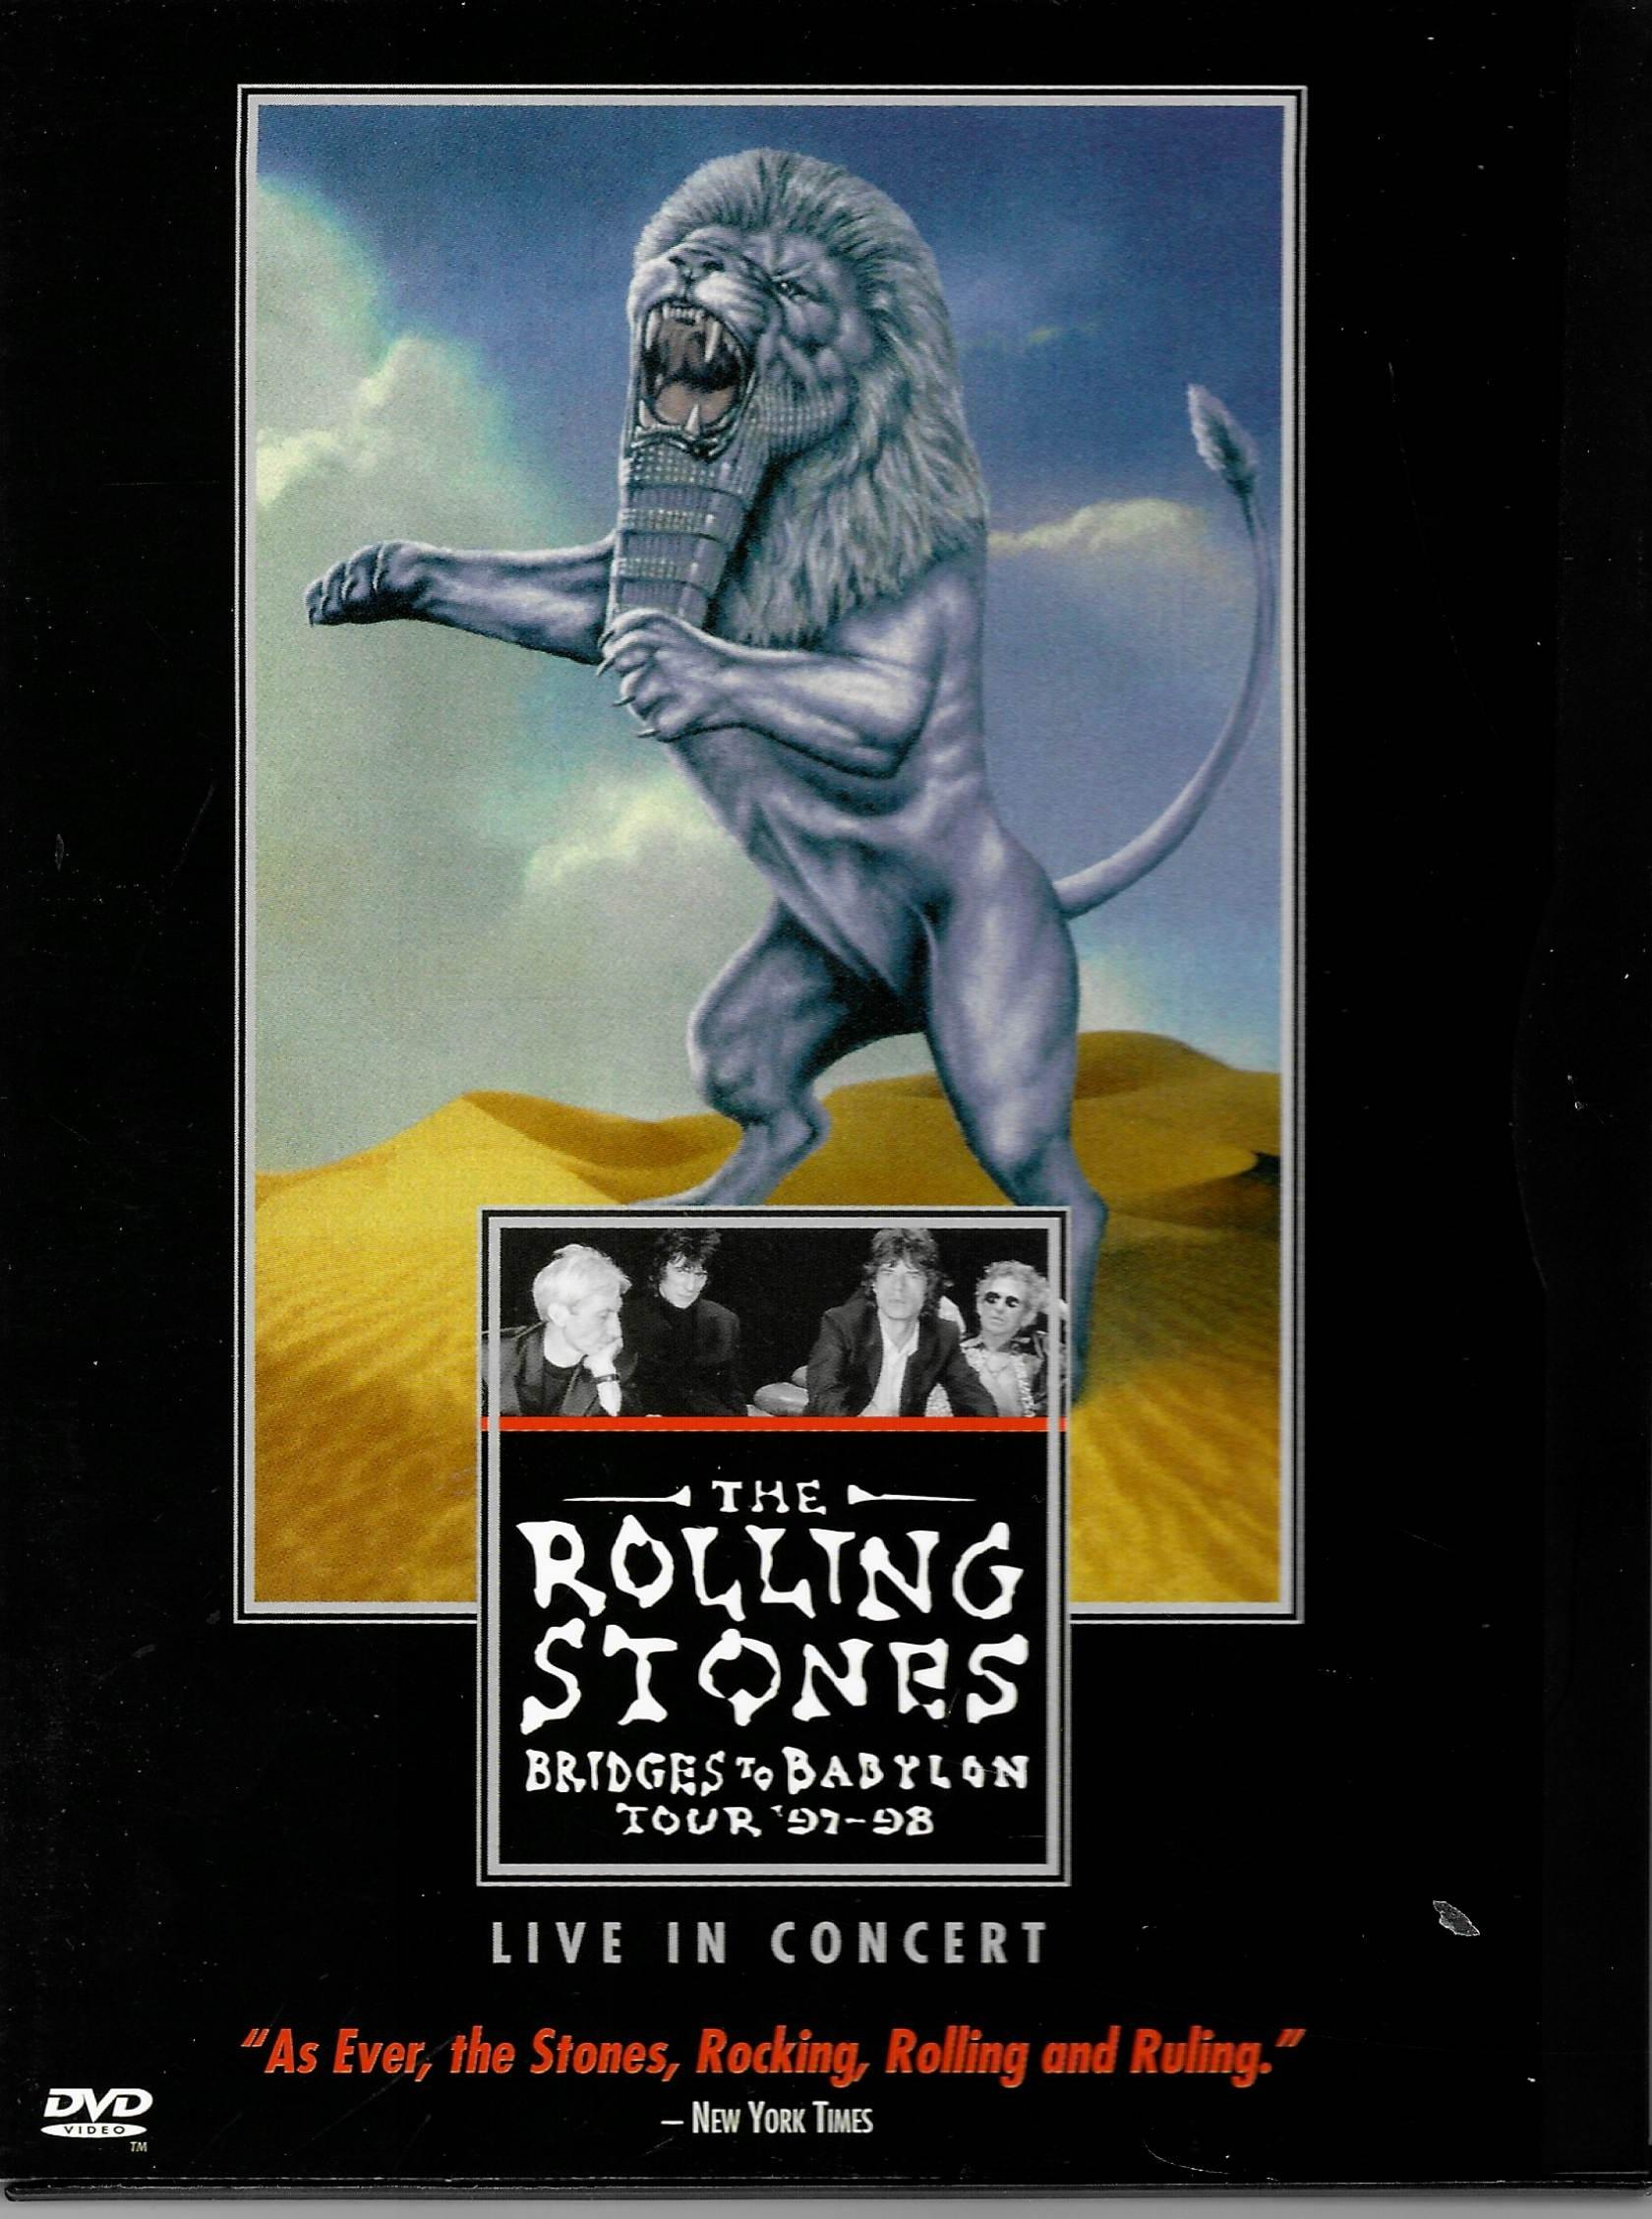 The Rolling Stones -Bridges To Babylon tour 97-98  - DVD plast /digipack